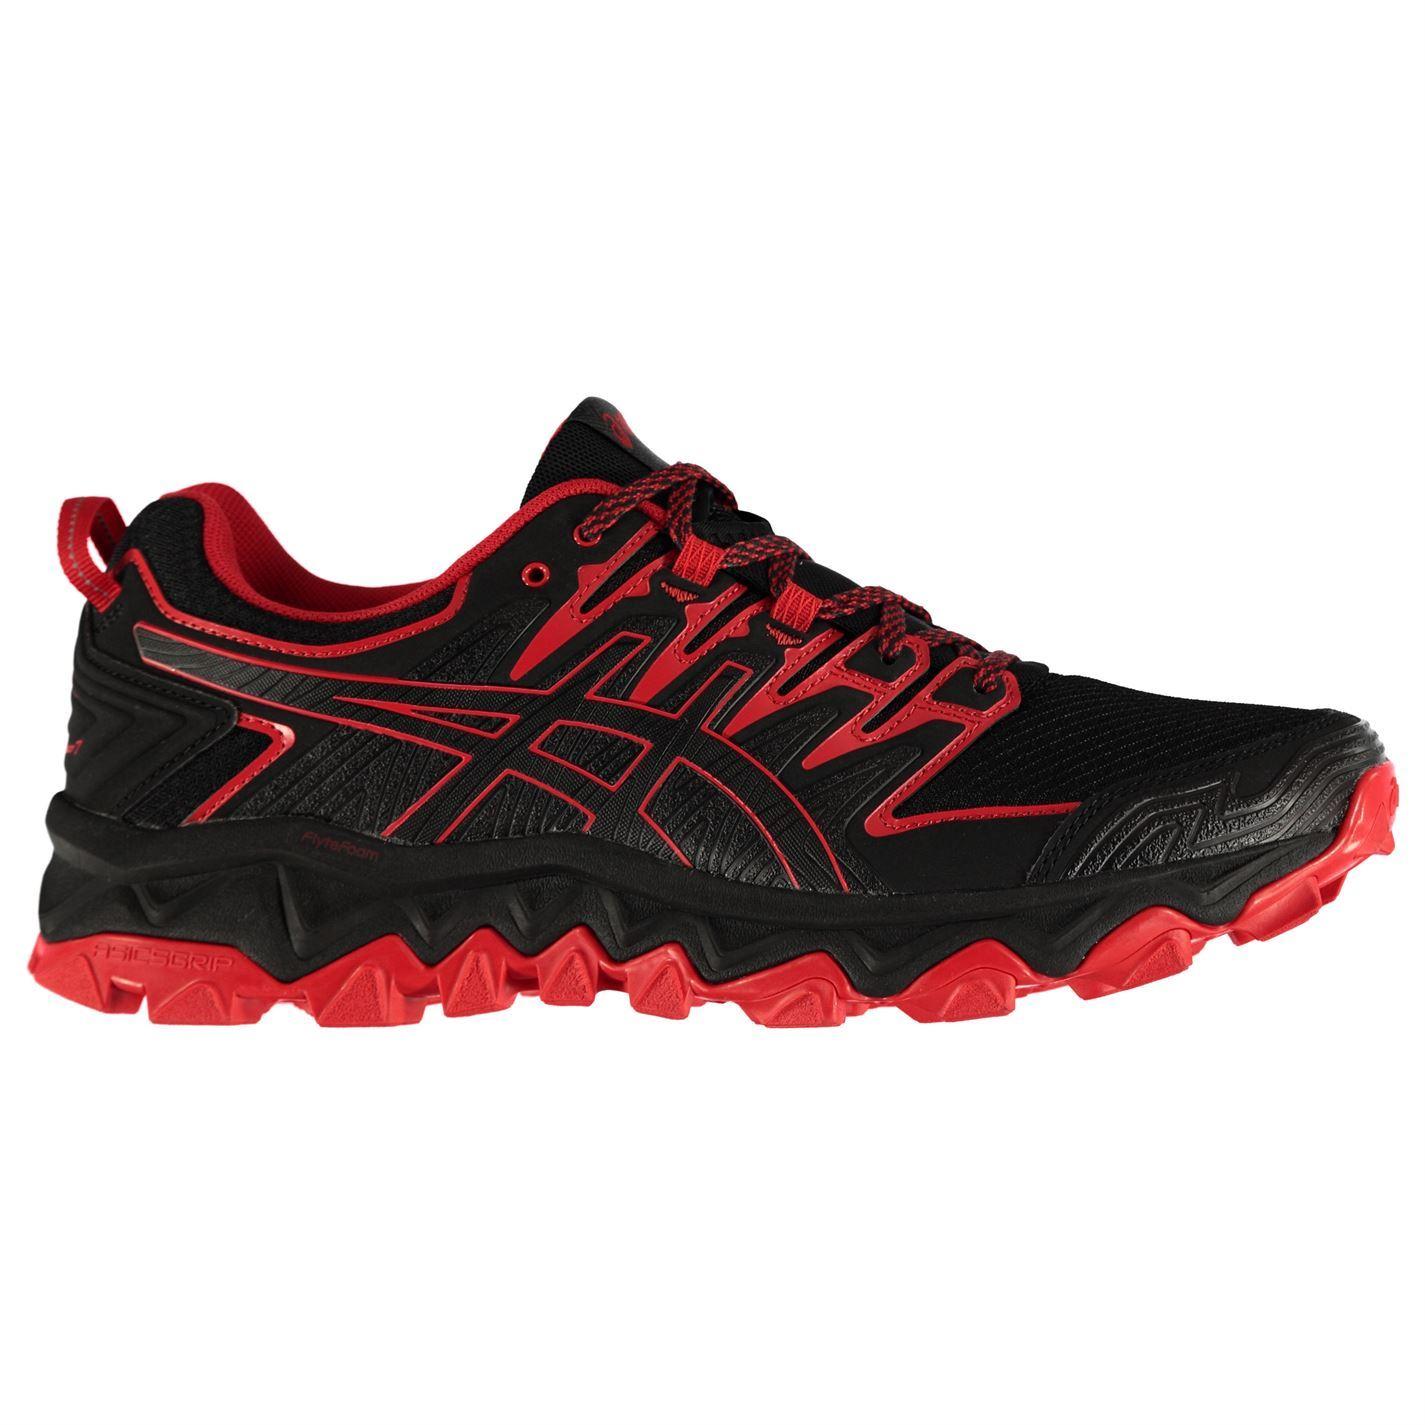 Detalles de Asics Gel Fujitrabuco 7 Zapatillas Running Hombre Fitness Trote